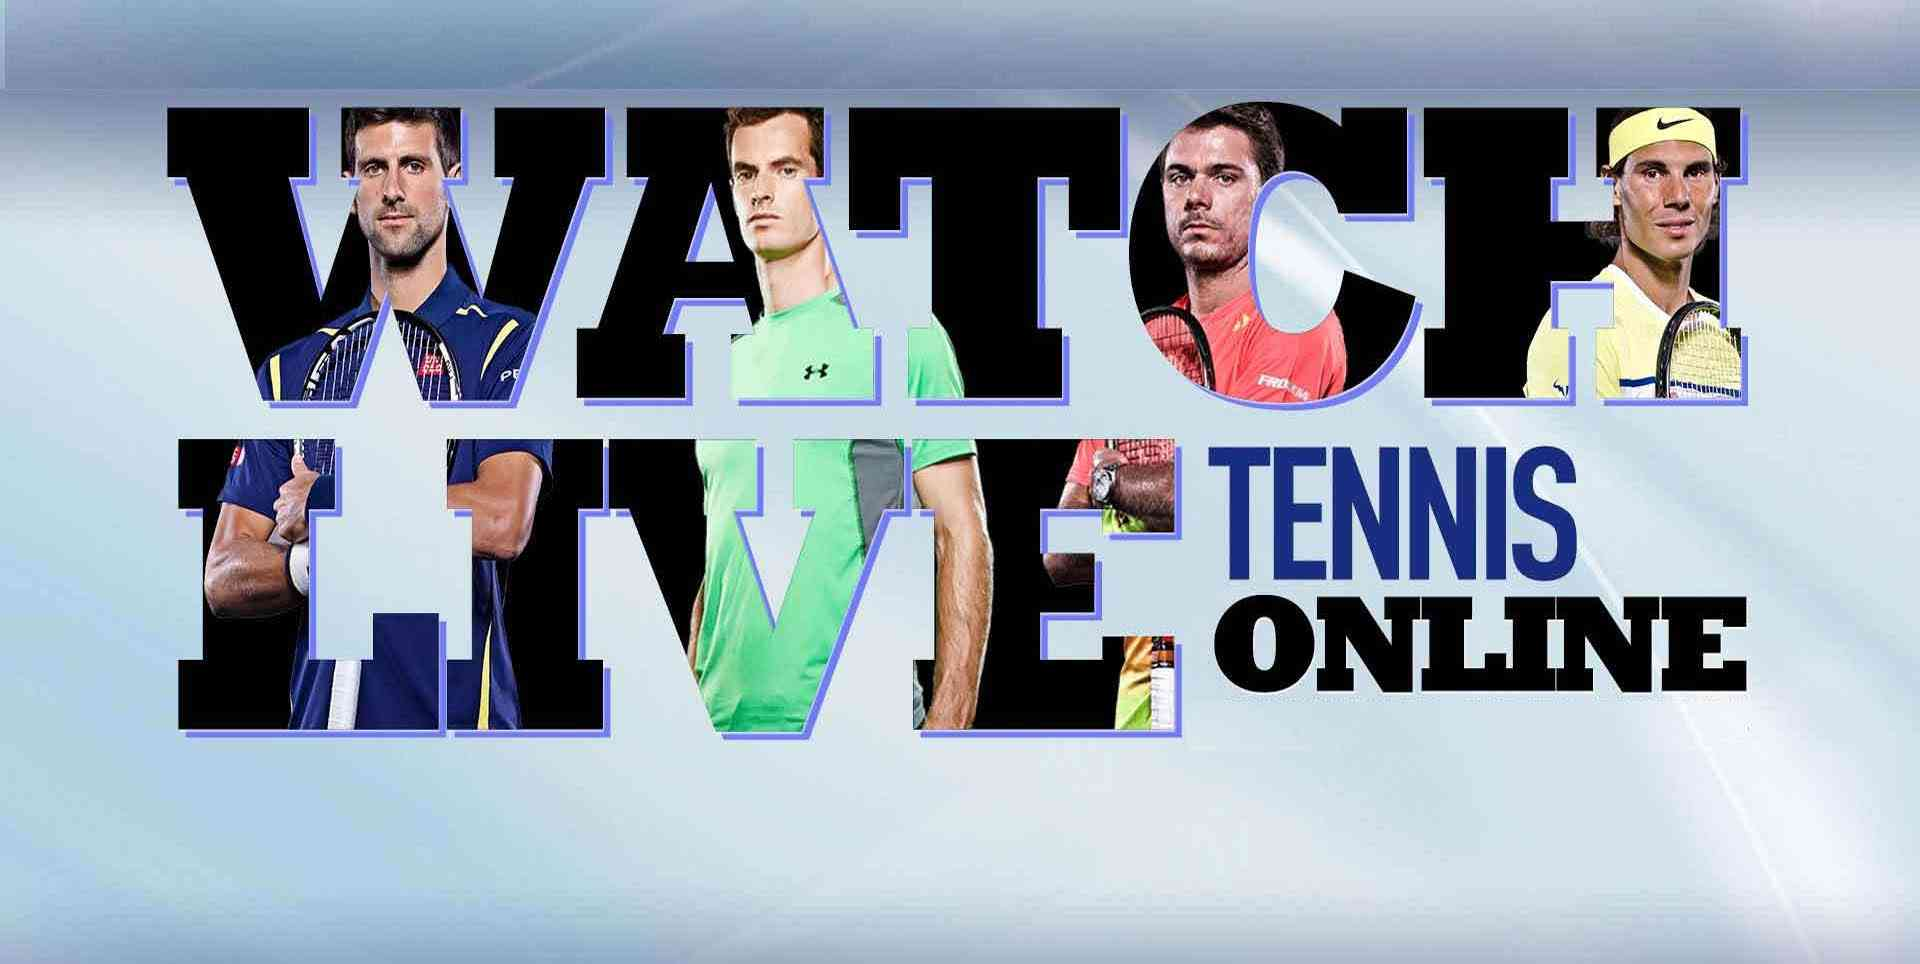 Watch L. Paes | R. Stepanek vs D. Nestor | N. Zimonjic Quarter Final 2014 Online